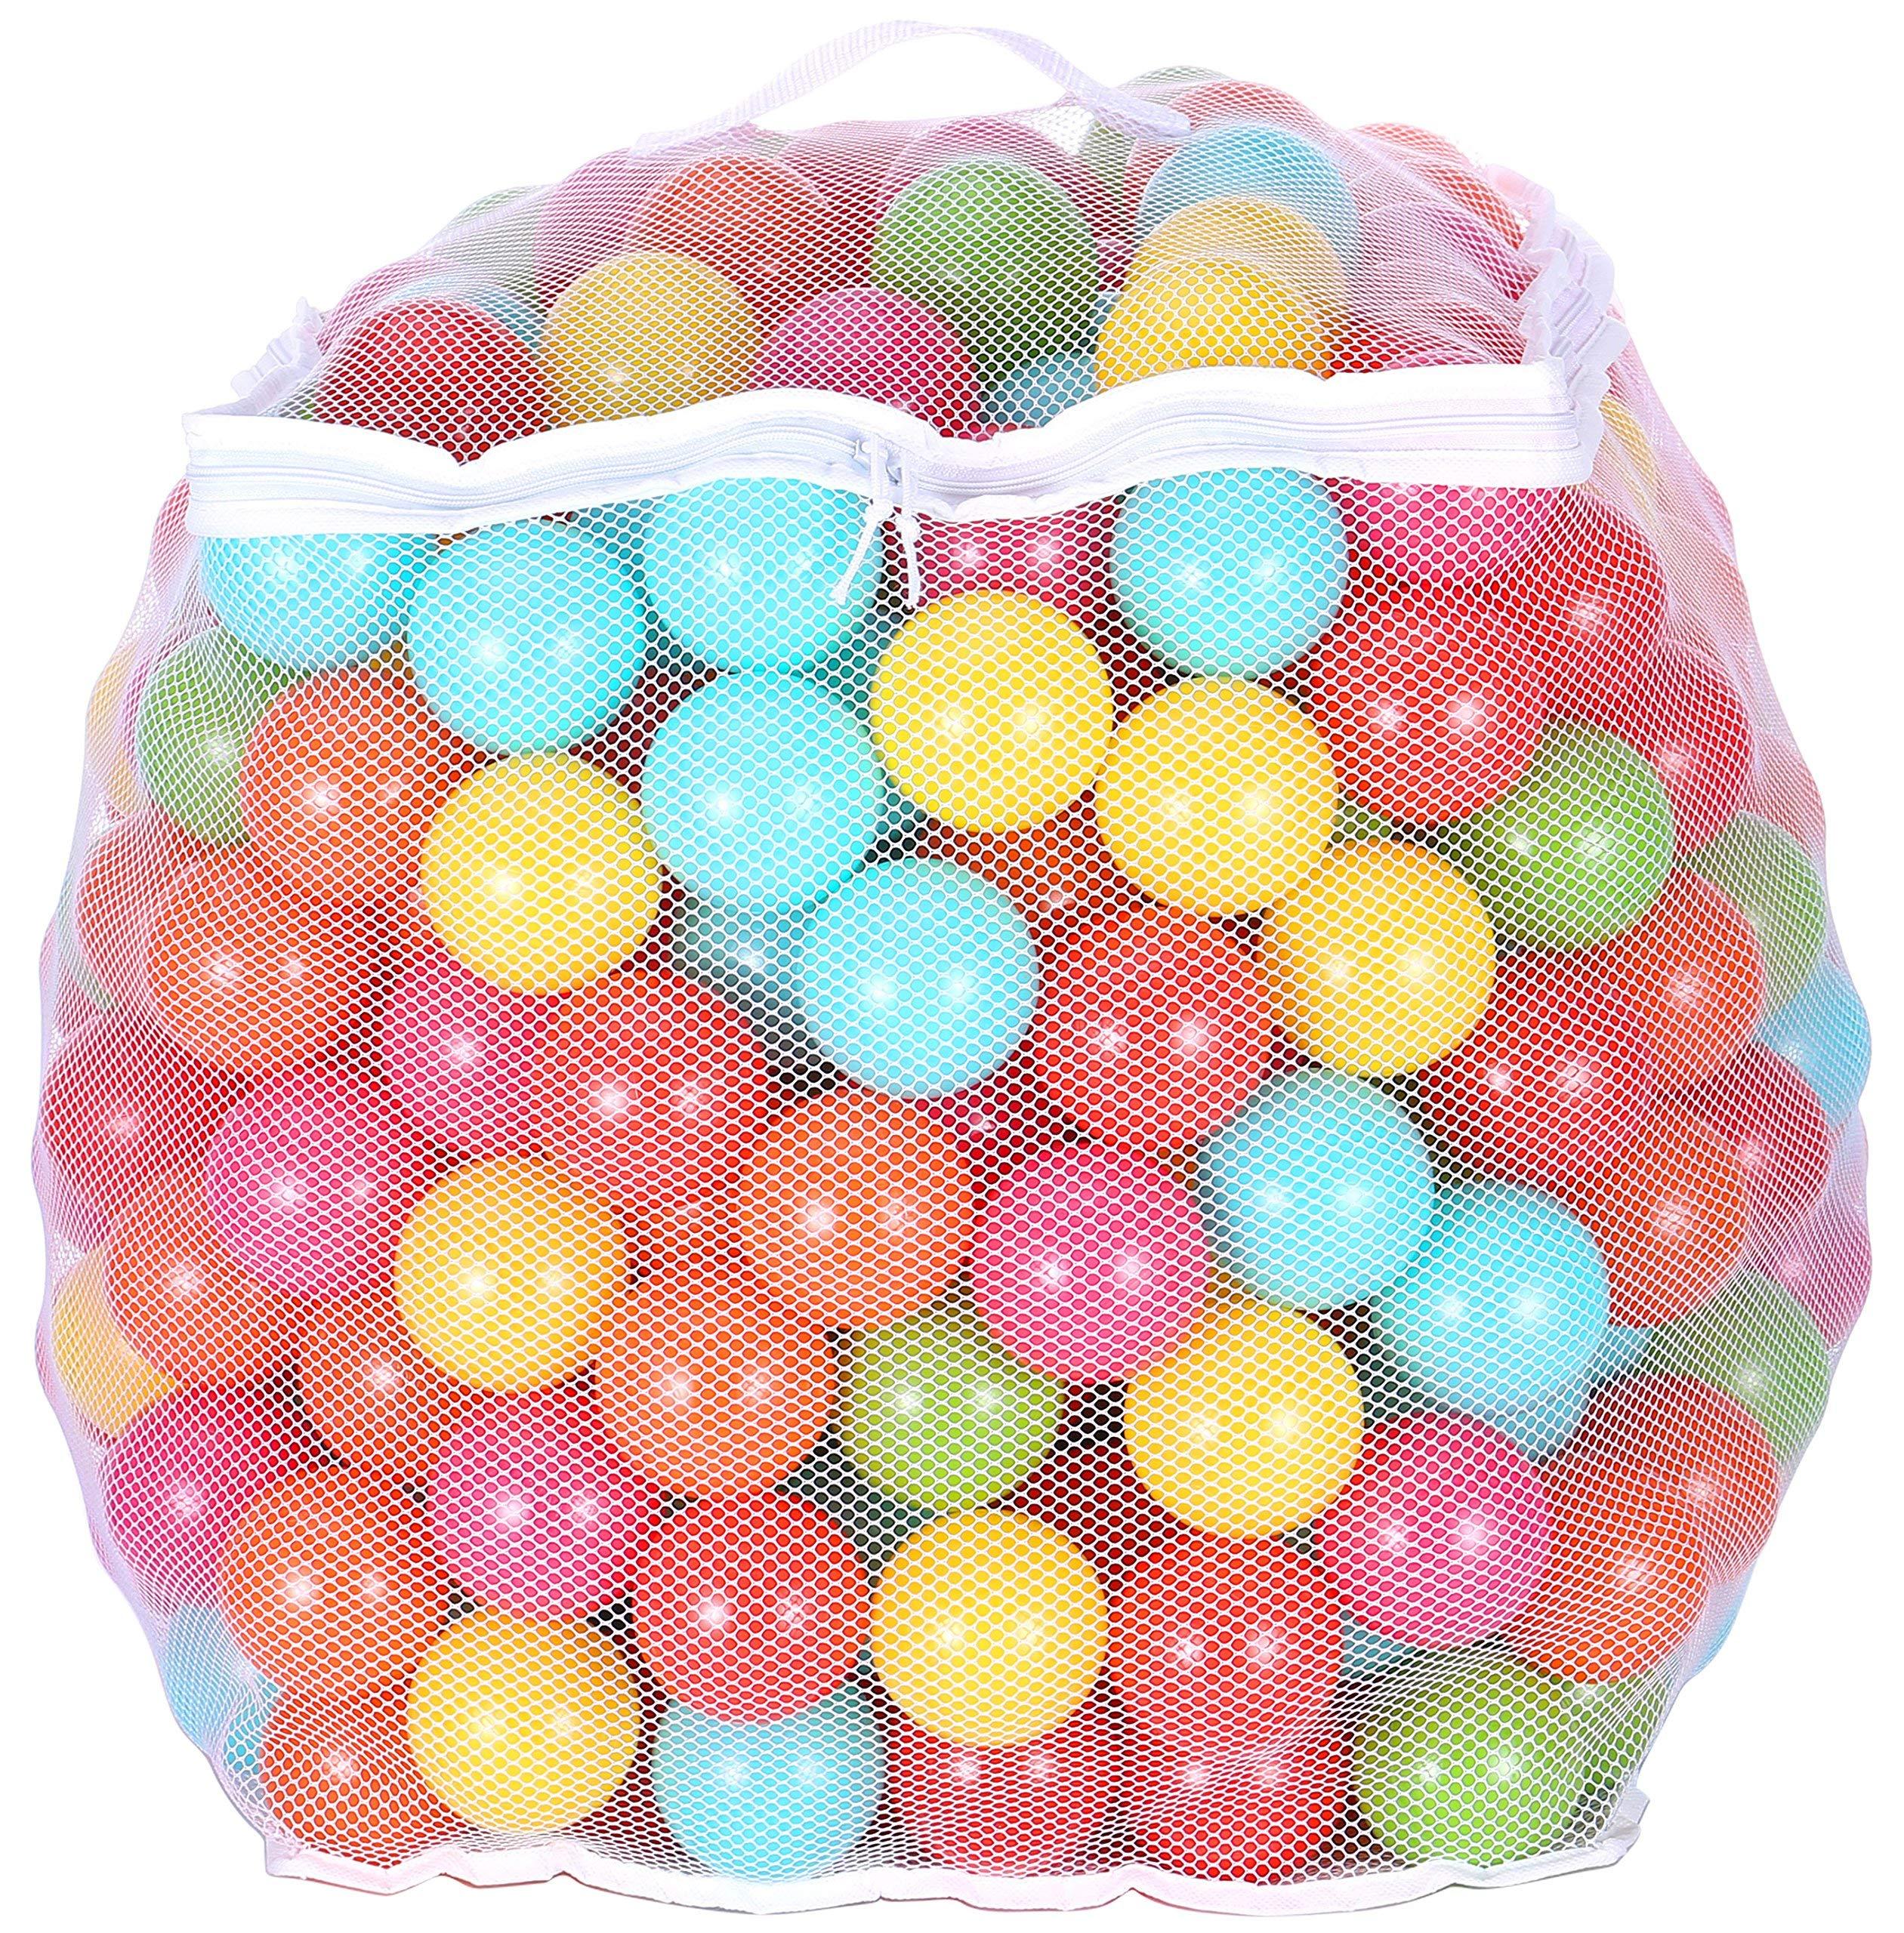 50 pcs Coloured Play Balls Phthalate Free BPA Free Crush Proof Plastic Ball Air-Filled Ocean Ball Pit Balls Reusable Fun Play Balls for Kids